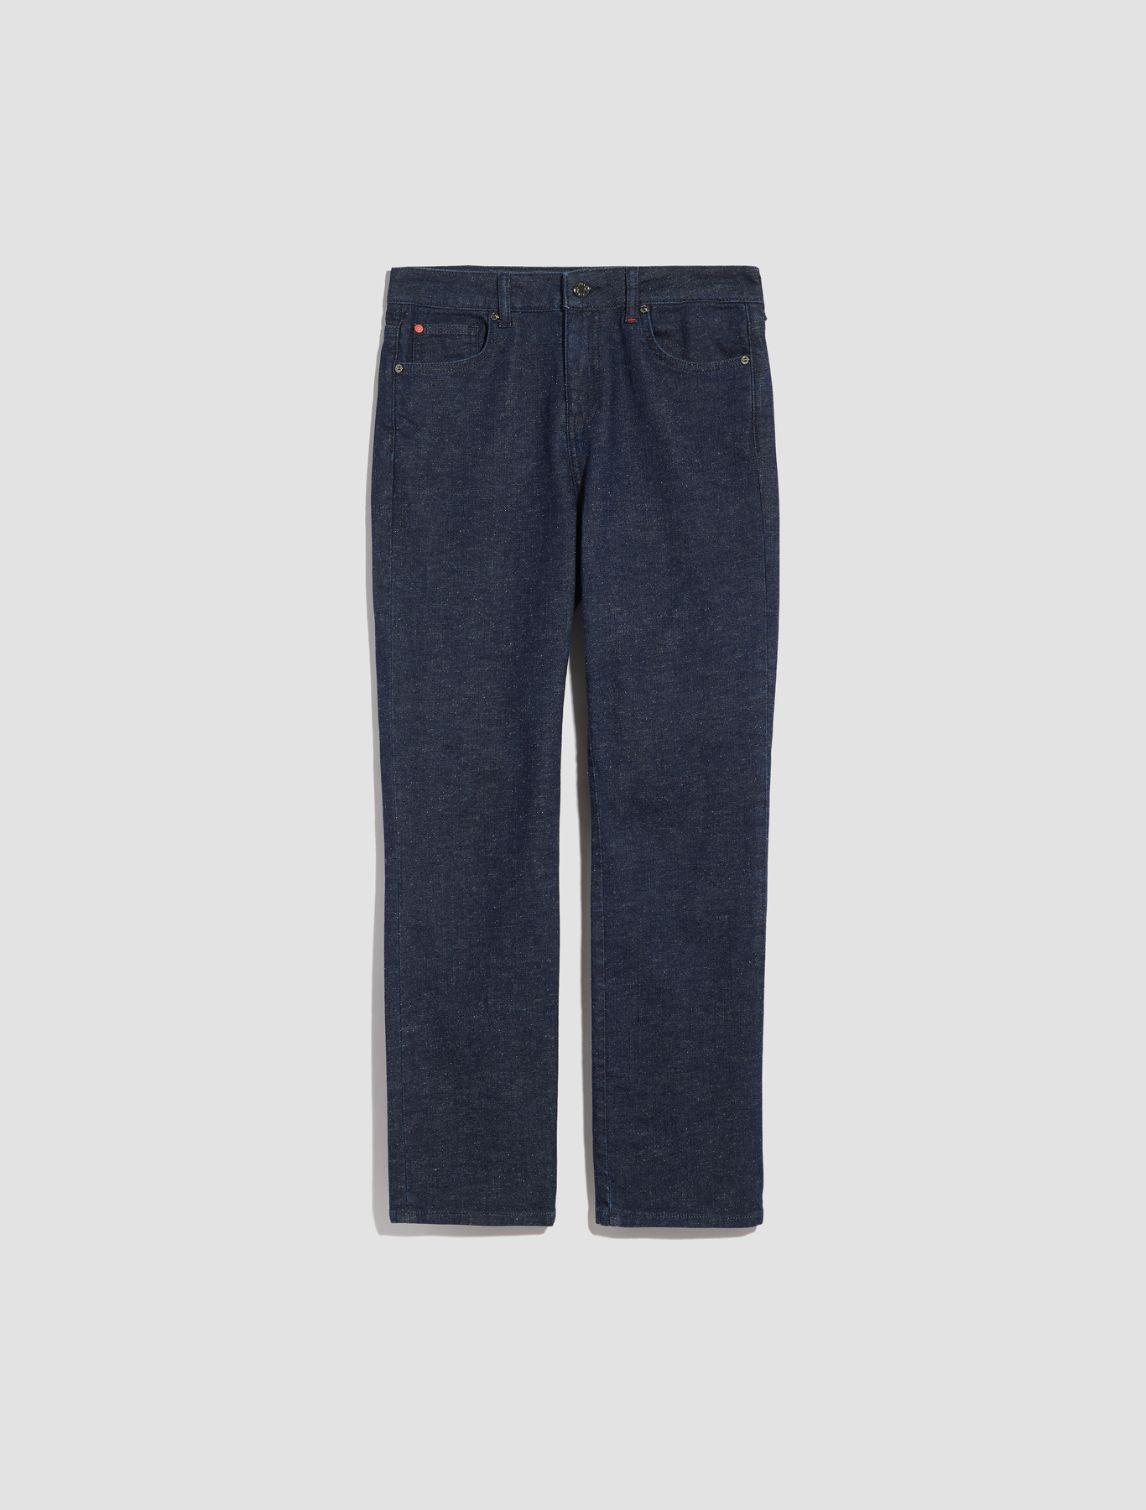 DENSITA Denim trouser midnight blue 5